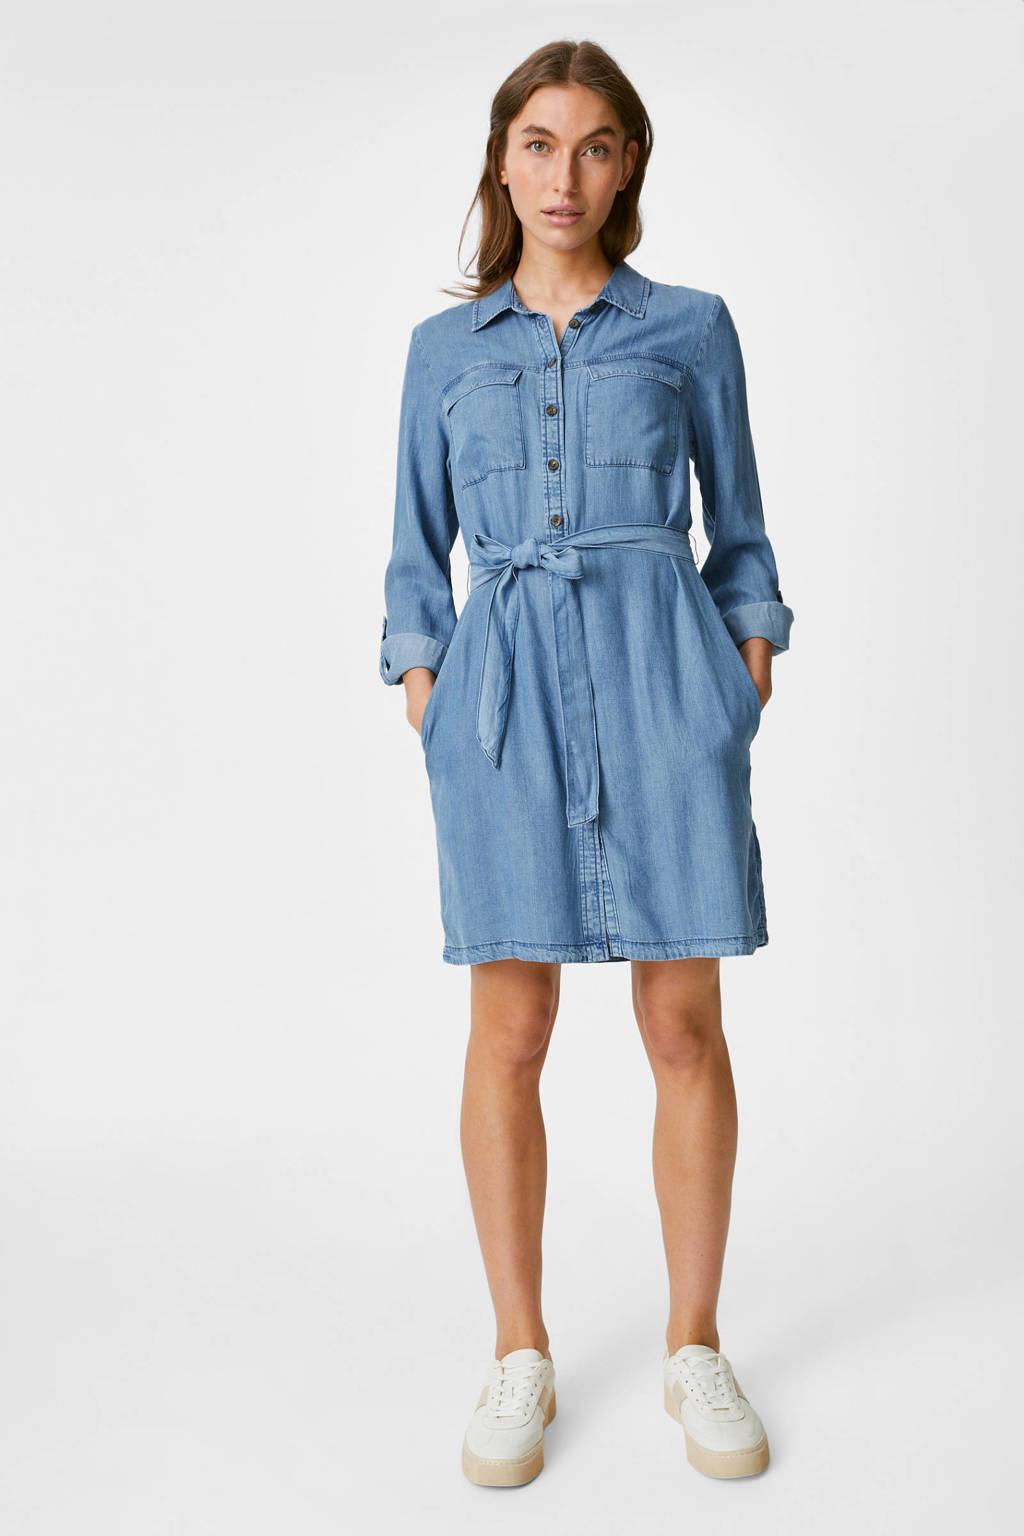 C&A Yessica blousejurk met ceintuur blauw, Blauw